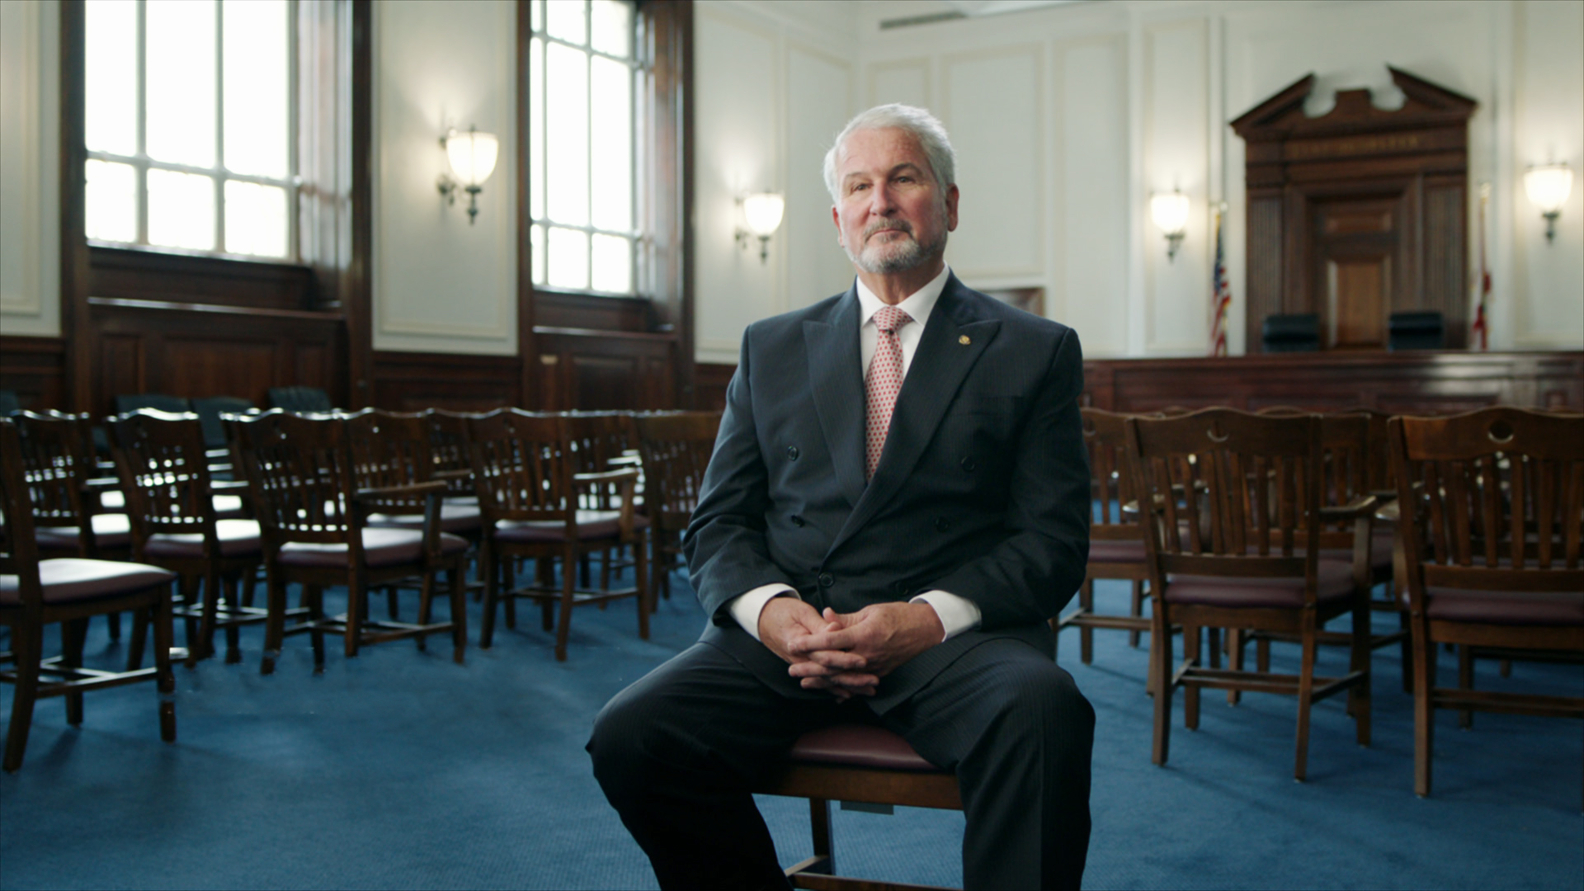 Mark Devereaux, Assistant U.S. Attorney